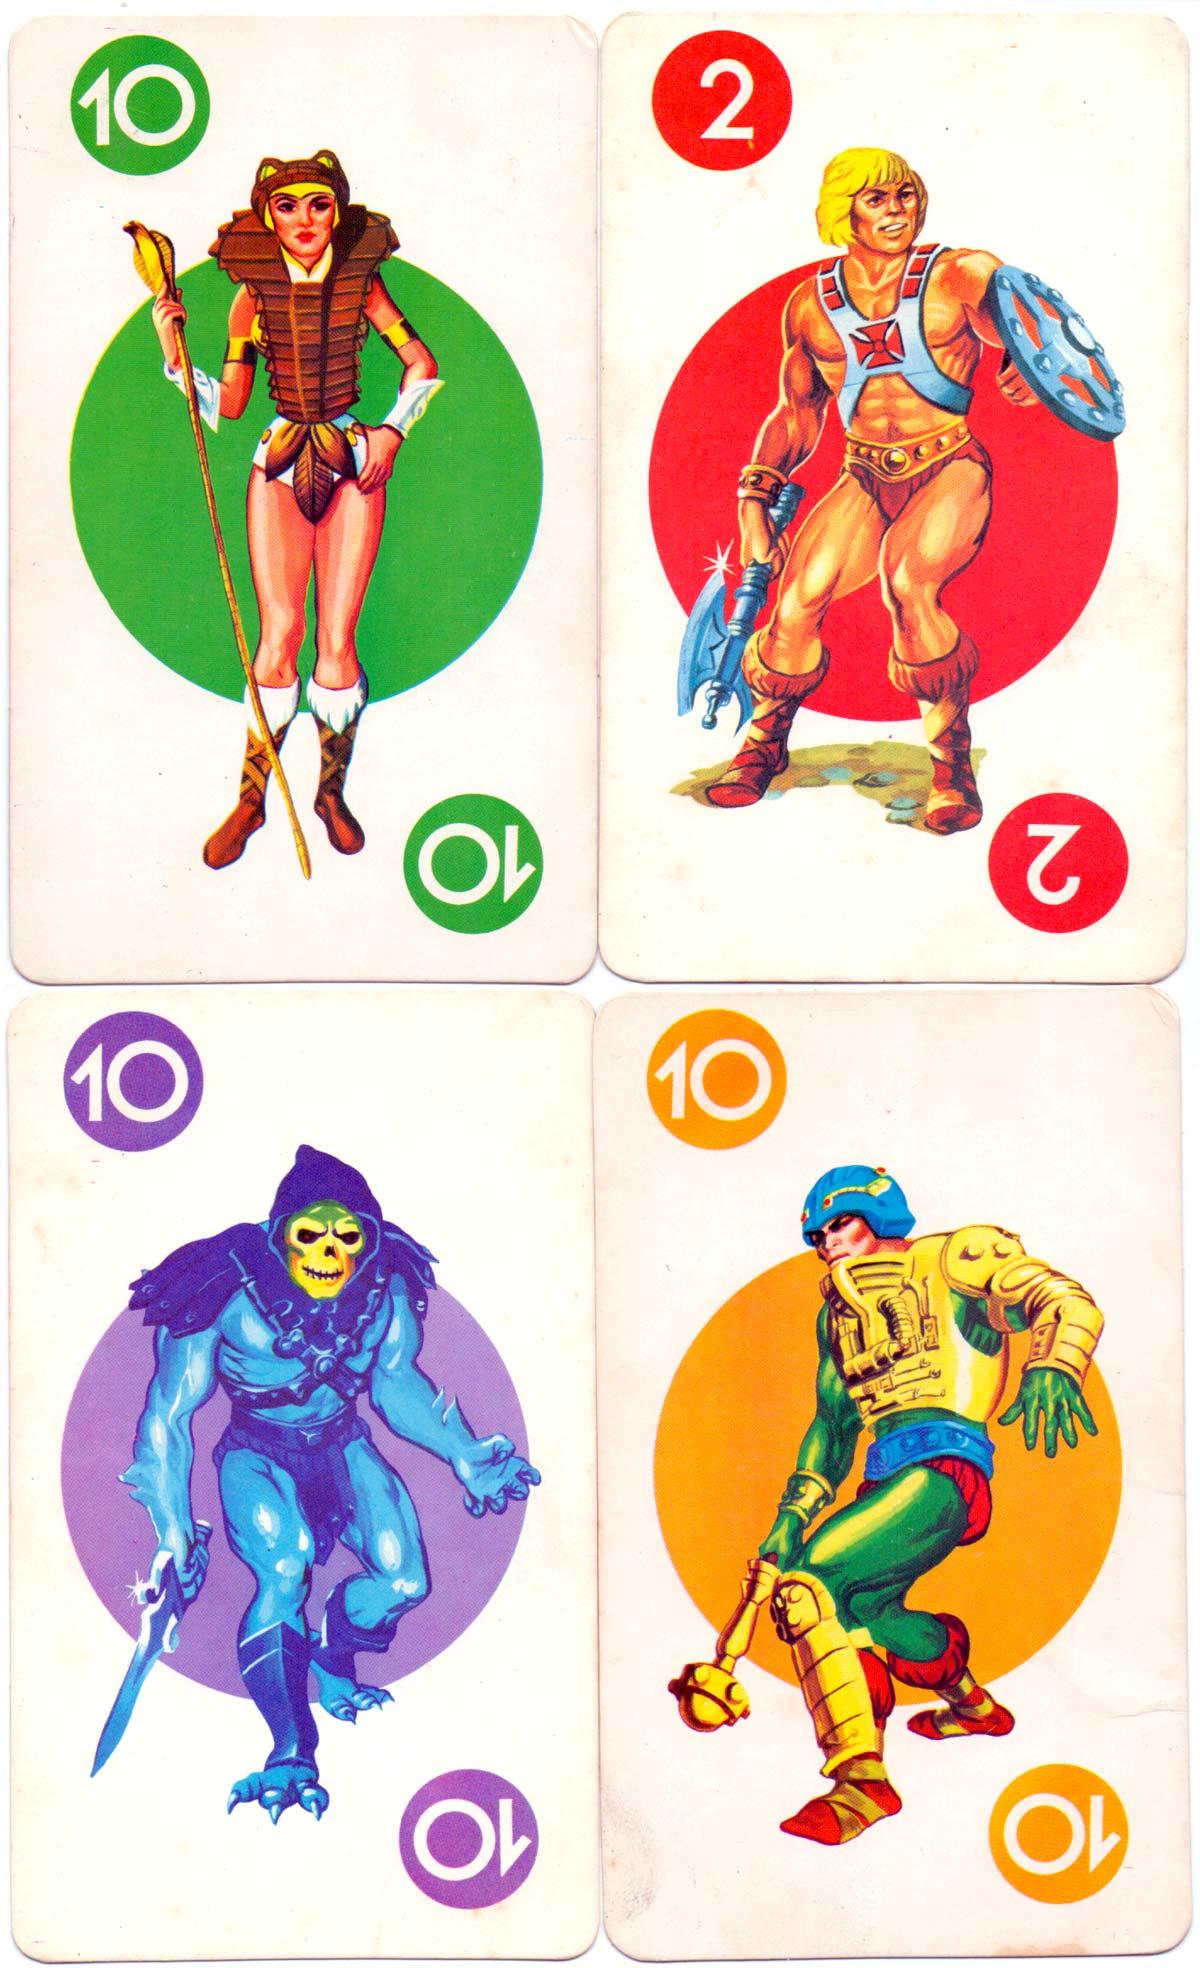 """Amos del Universo"" card game published by Lito Goicochea Hnos, S.A., Peru, c.1980"